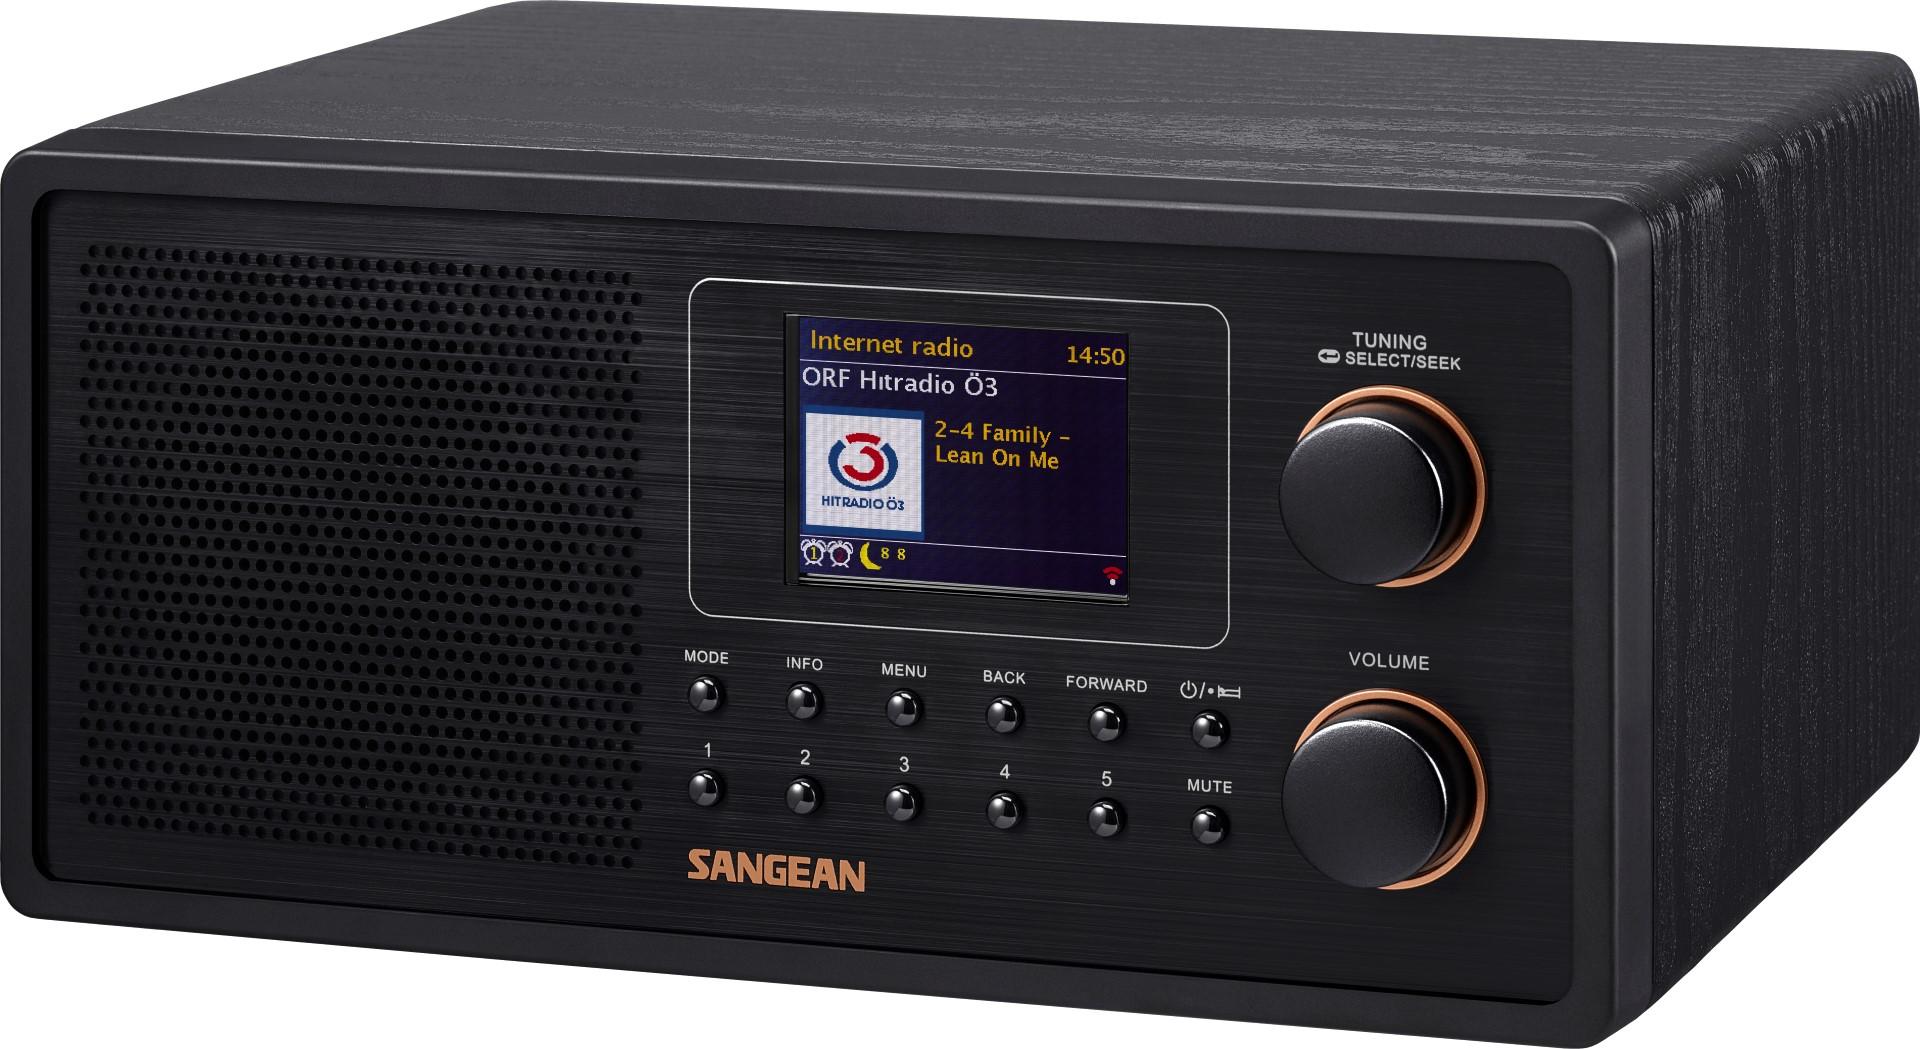 Internet radio met DAB+, FM, USB en Spotify - Sangean WFR-30